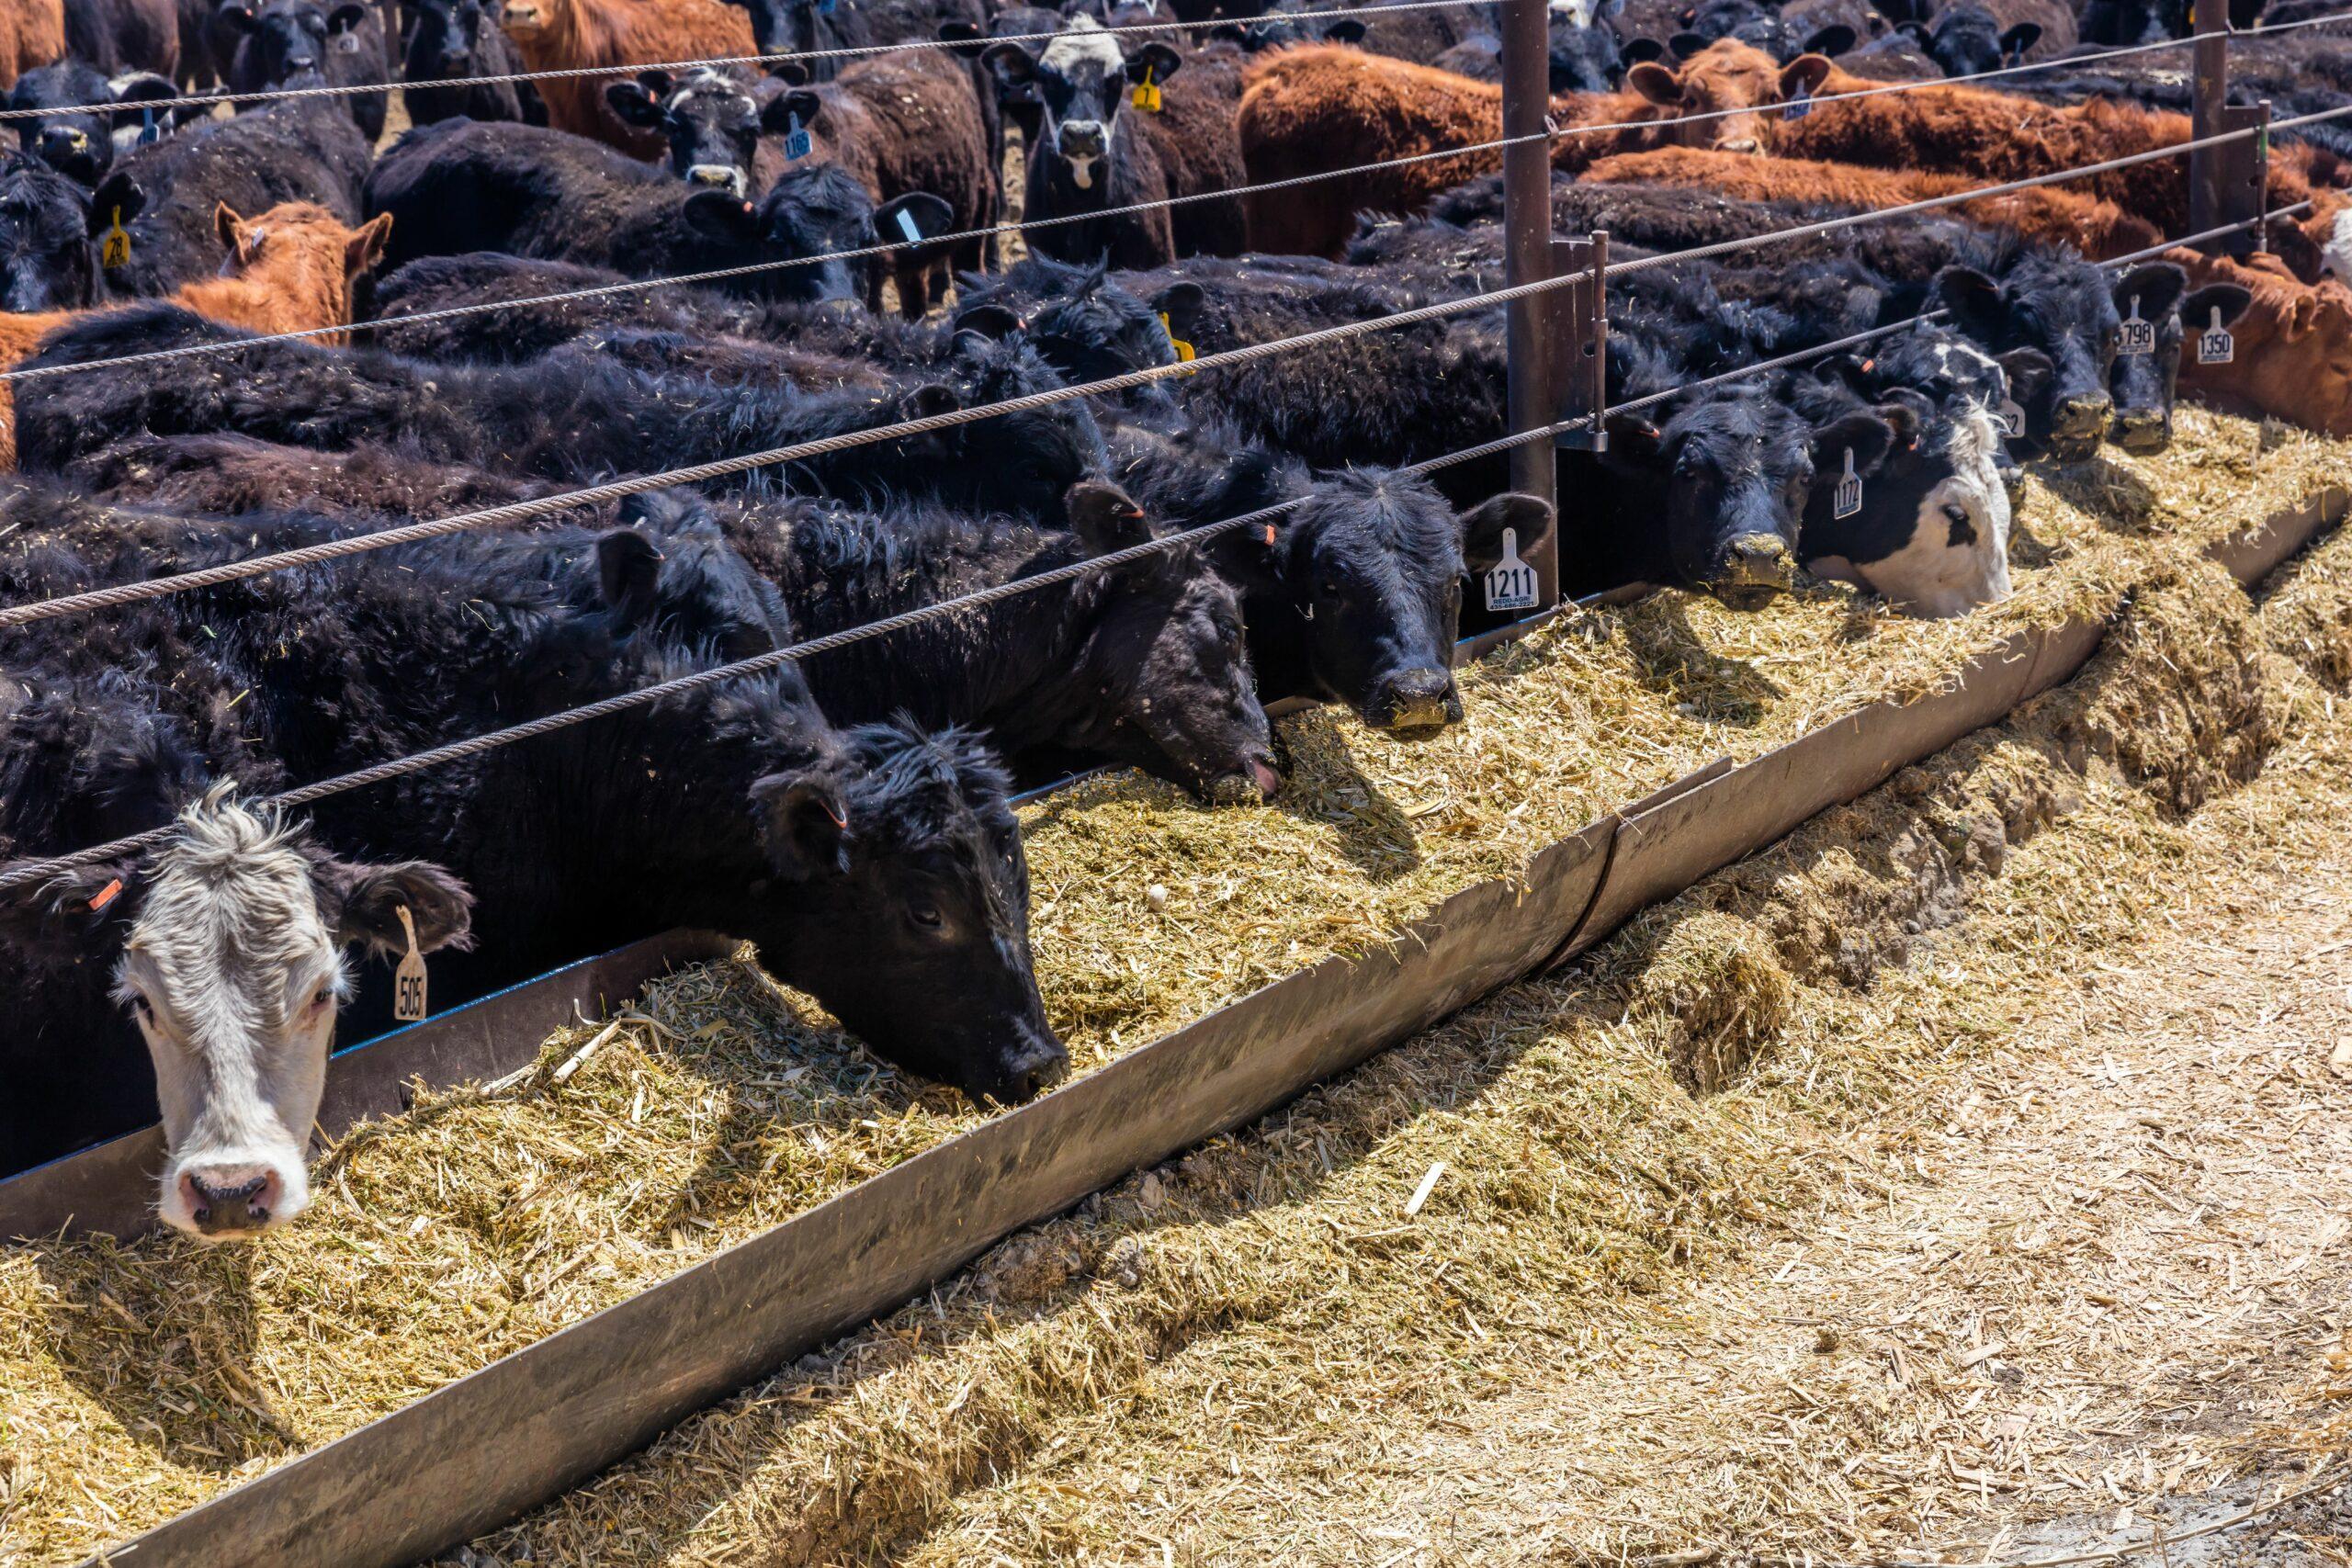 Cattle eating hay in cattle feedlot in Utah. Credit:Joe Sohm/Visions of America/Universal Images Group via Getty Images